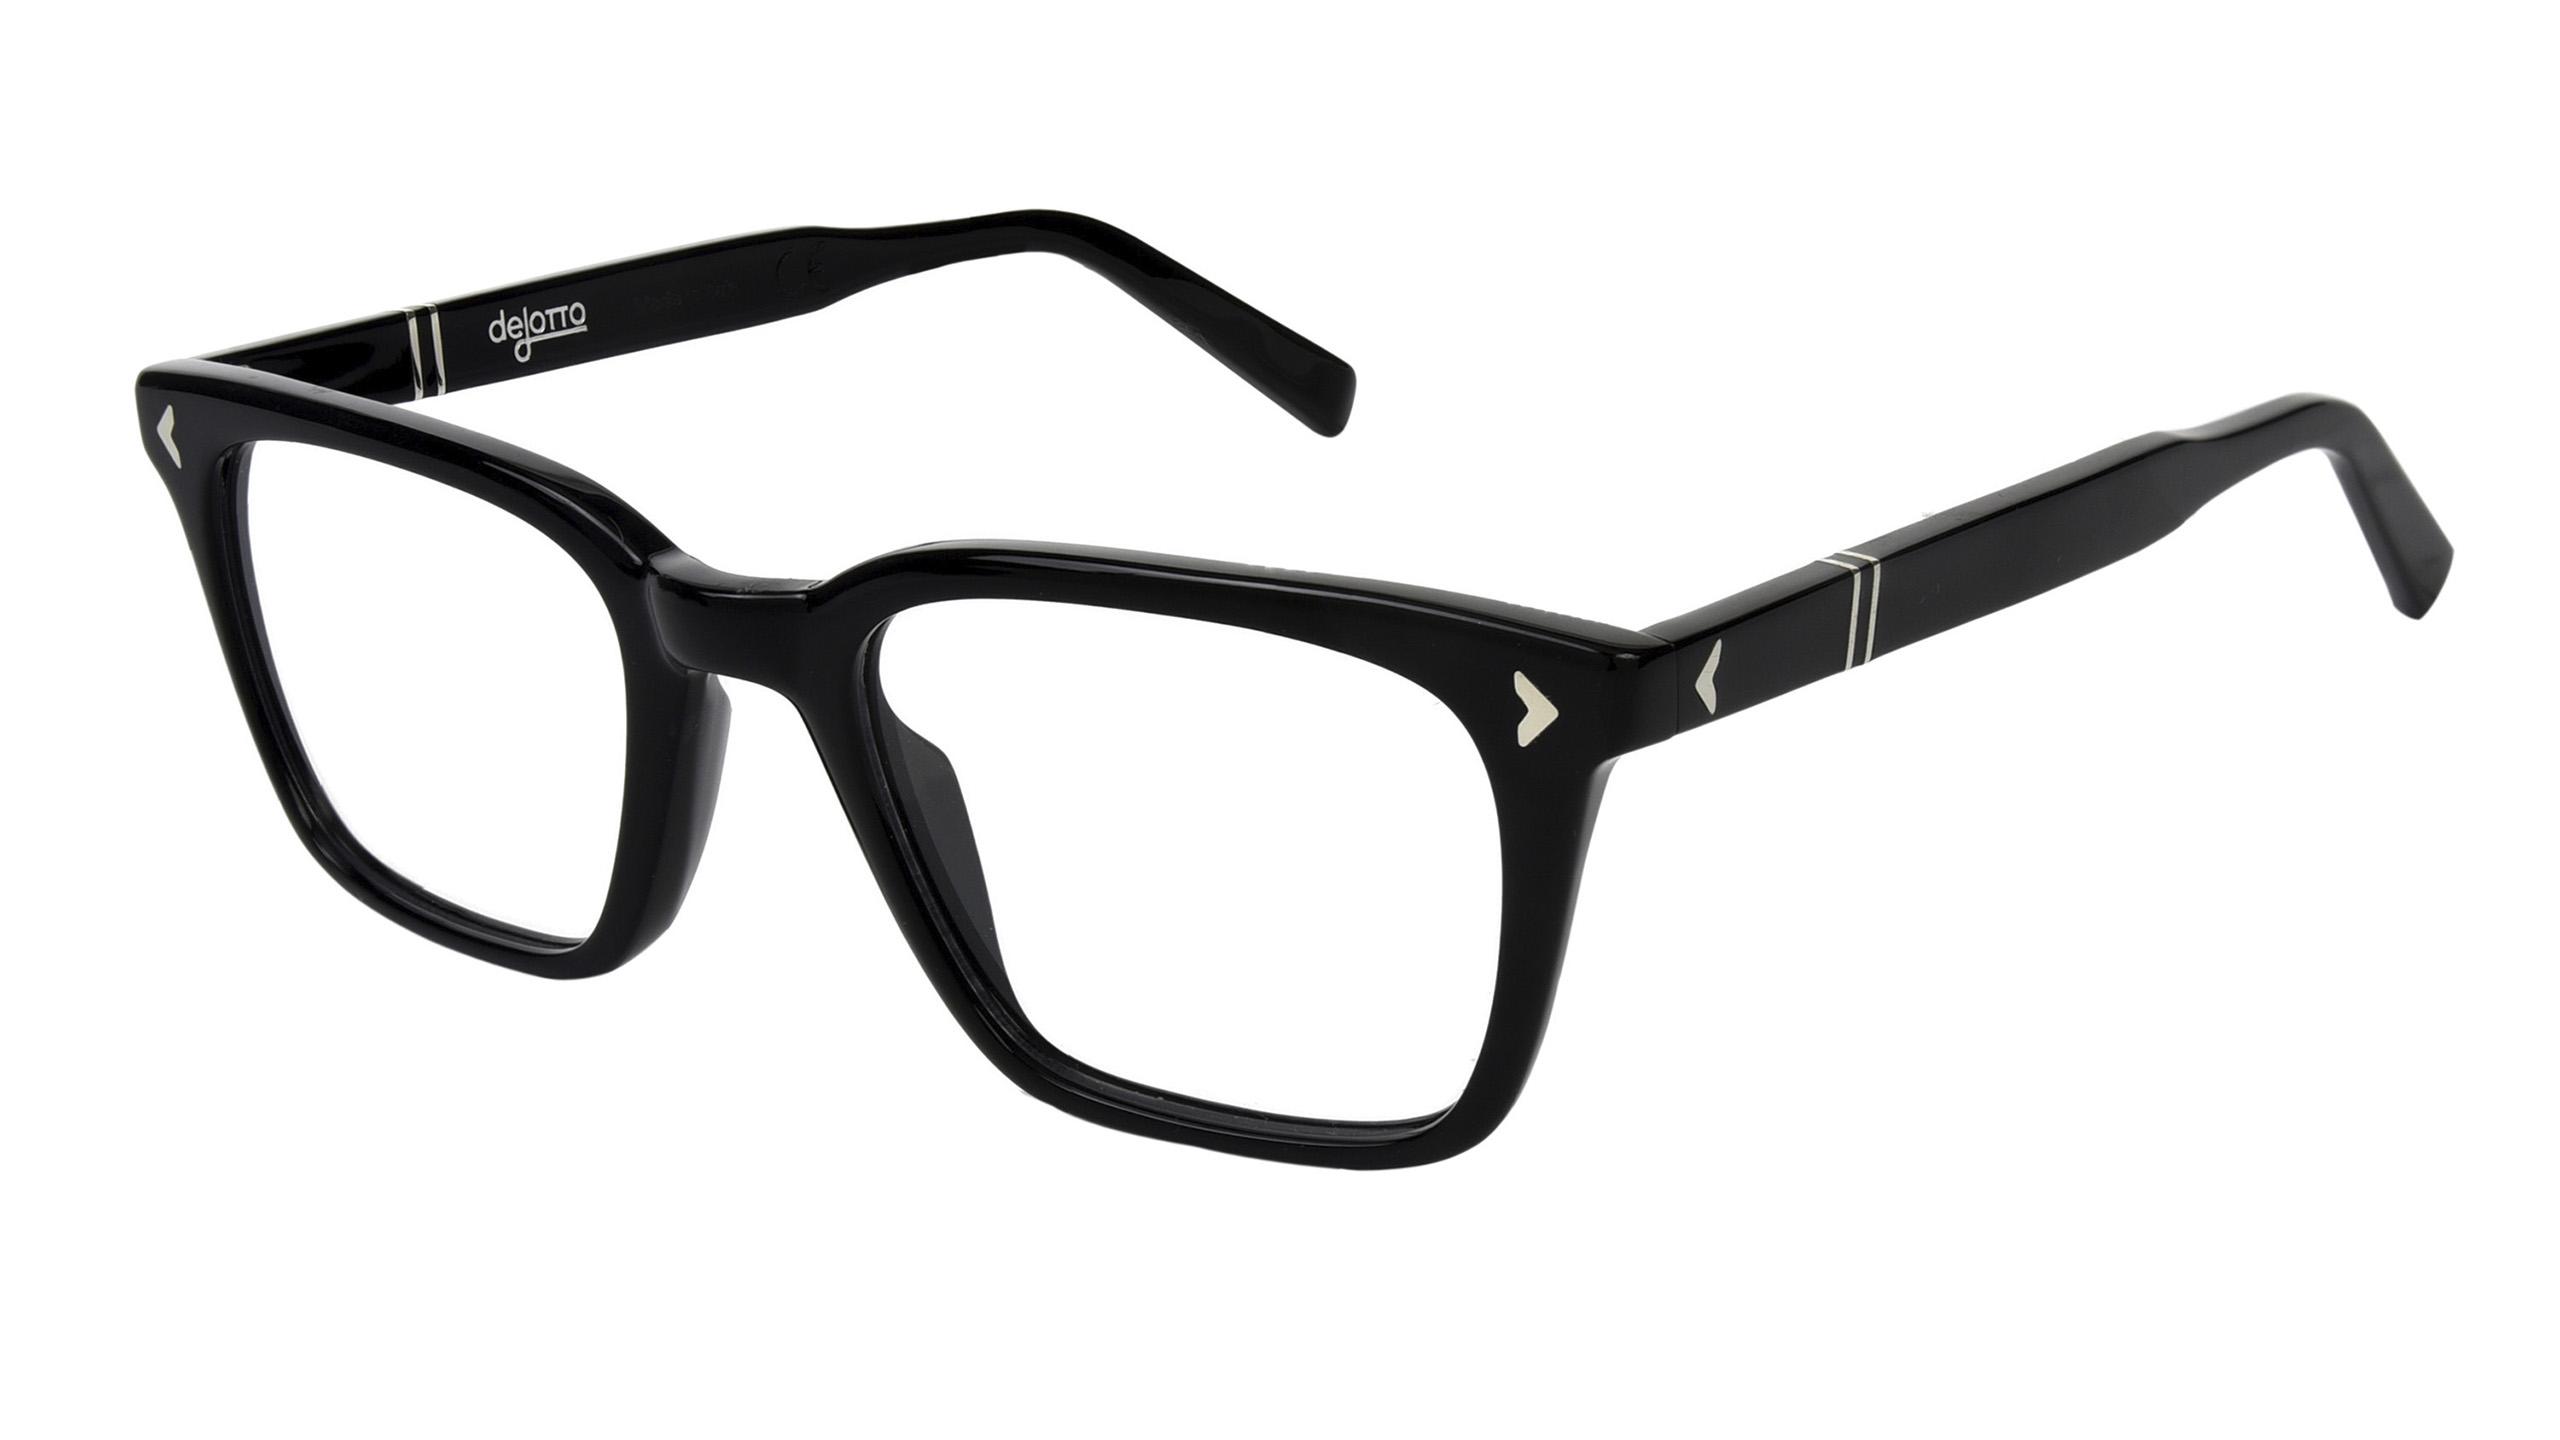 DL 55 c.8001 – Black